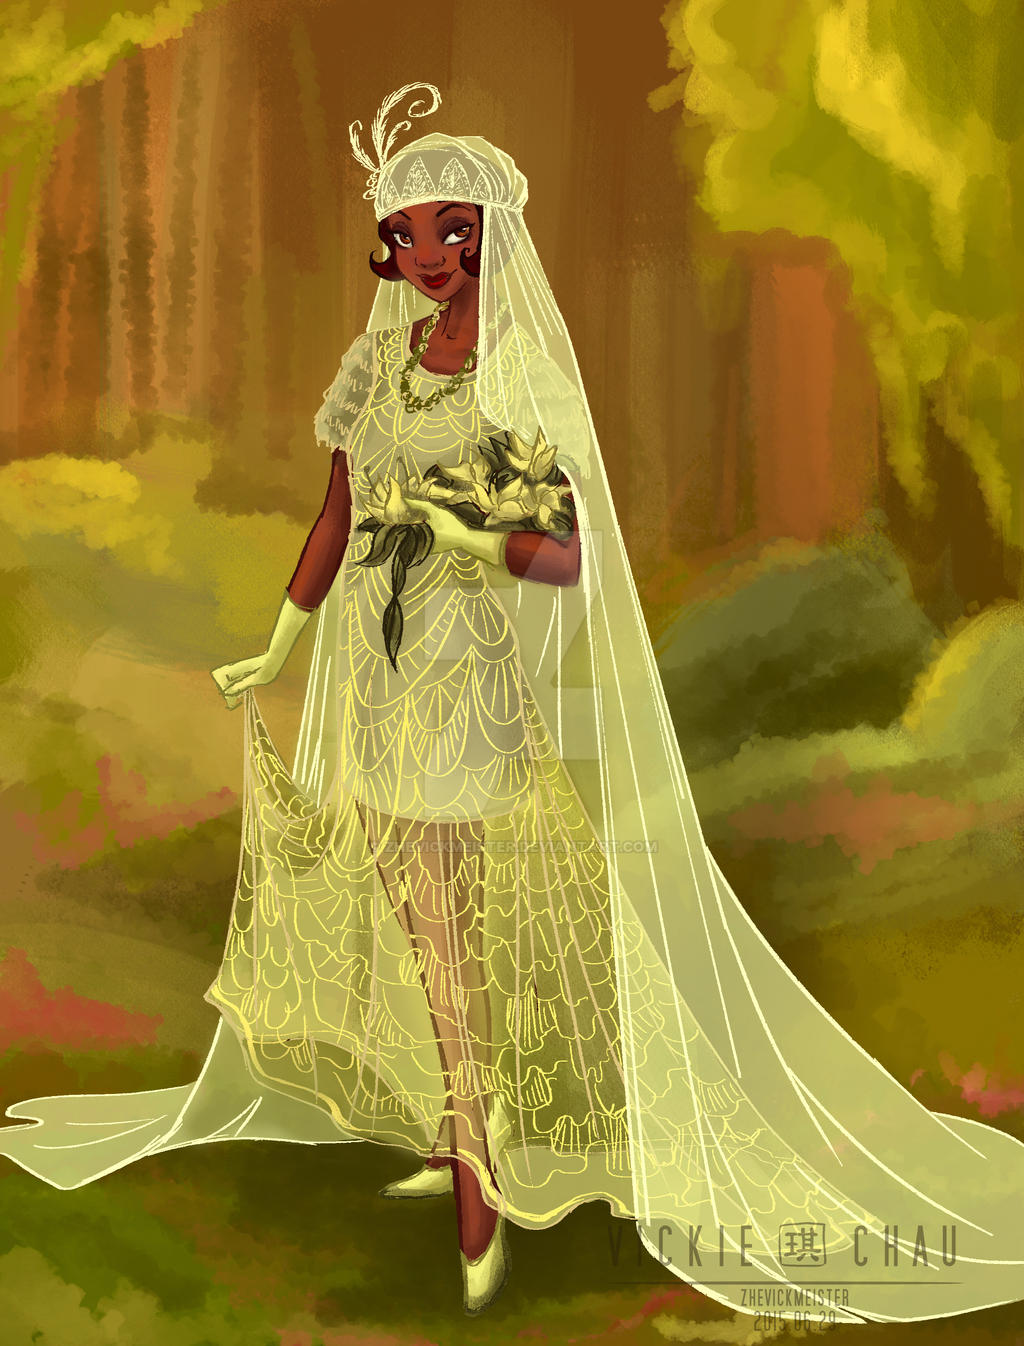 Wedding dress tiana by zhevickmeister on deviantart for Princess tiana wedding dress